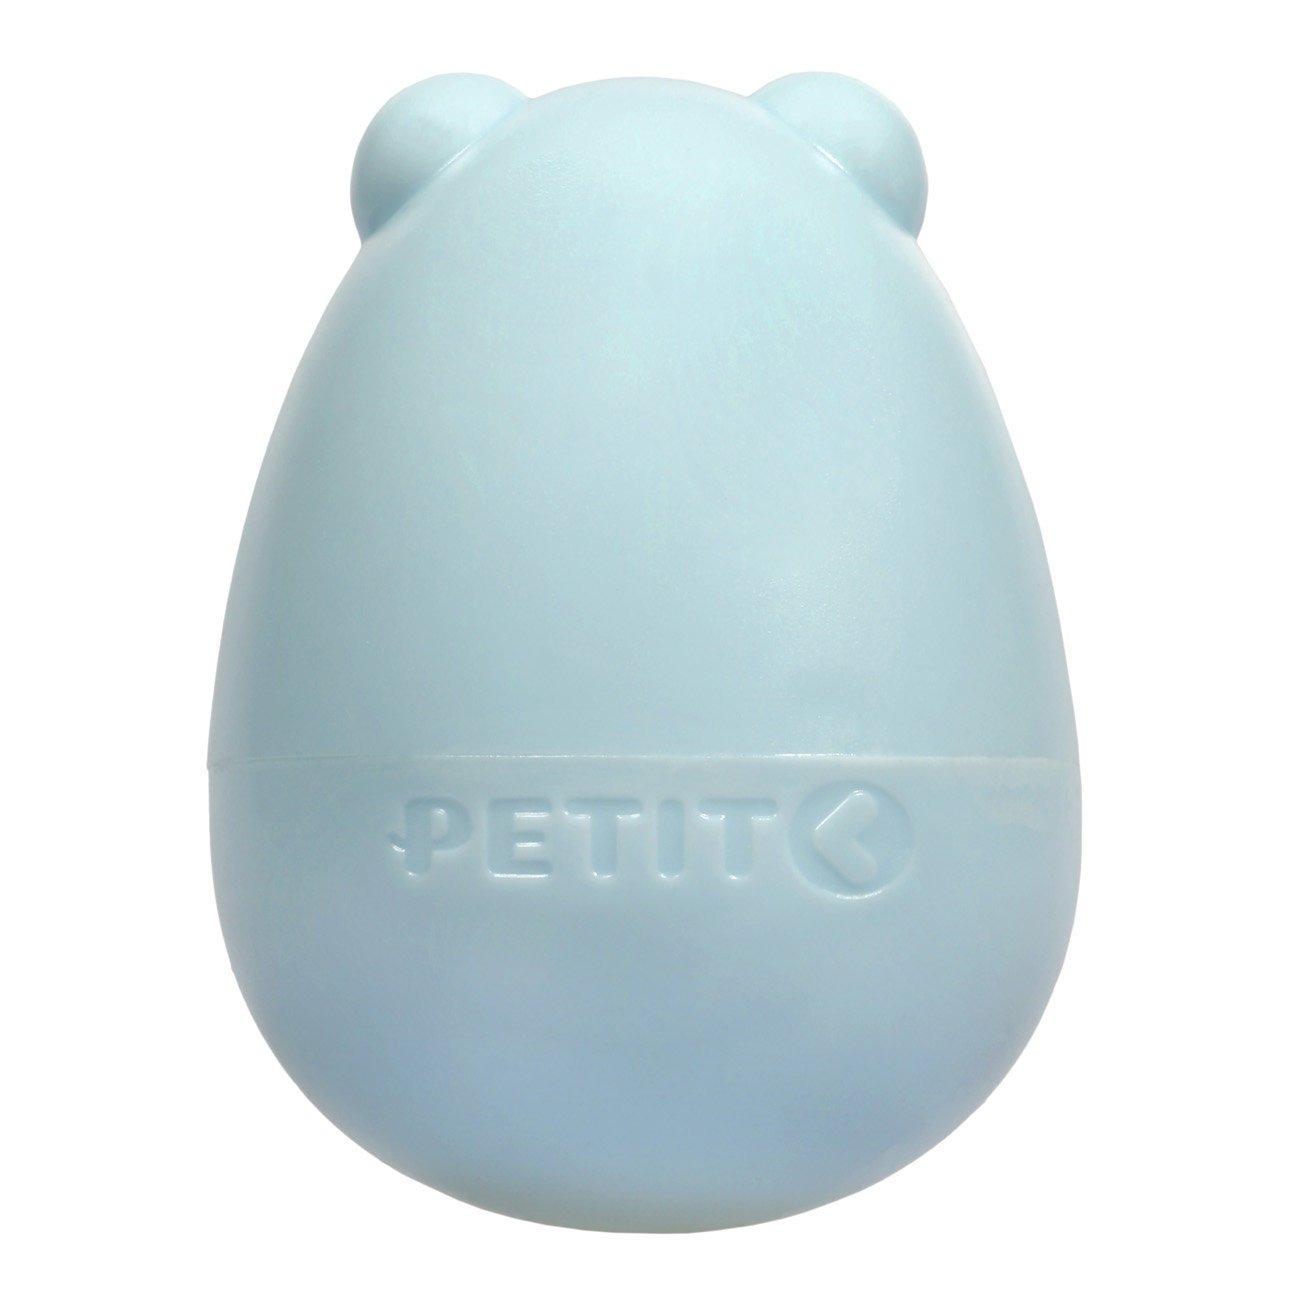 Petit Drehendes Welpenspielzeug Balu, Bild 9